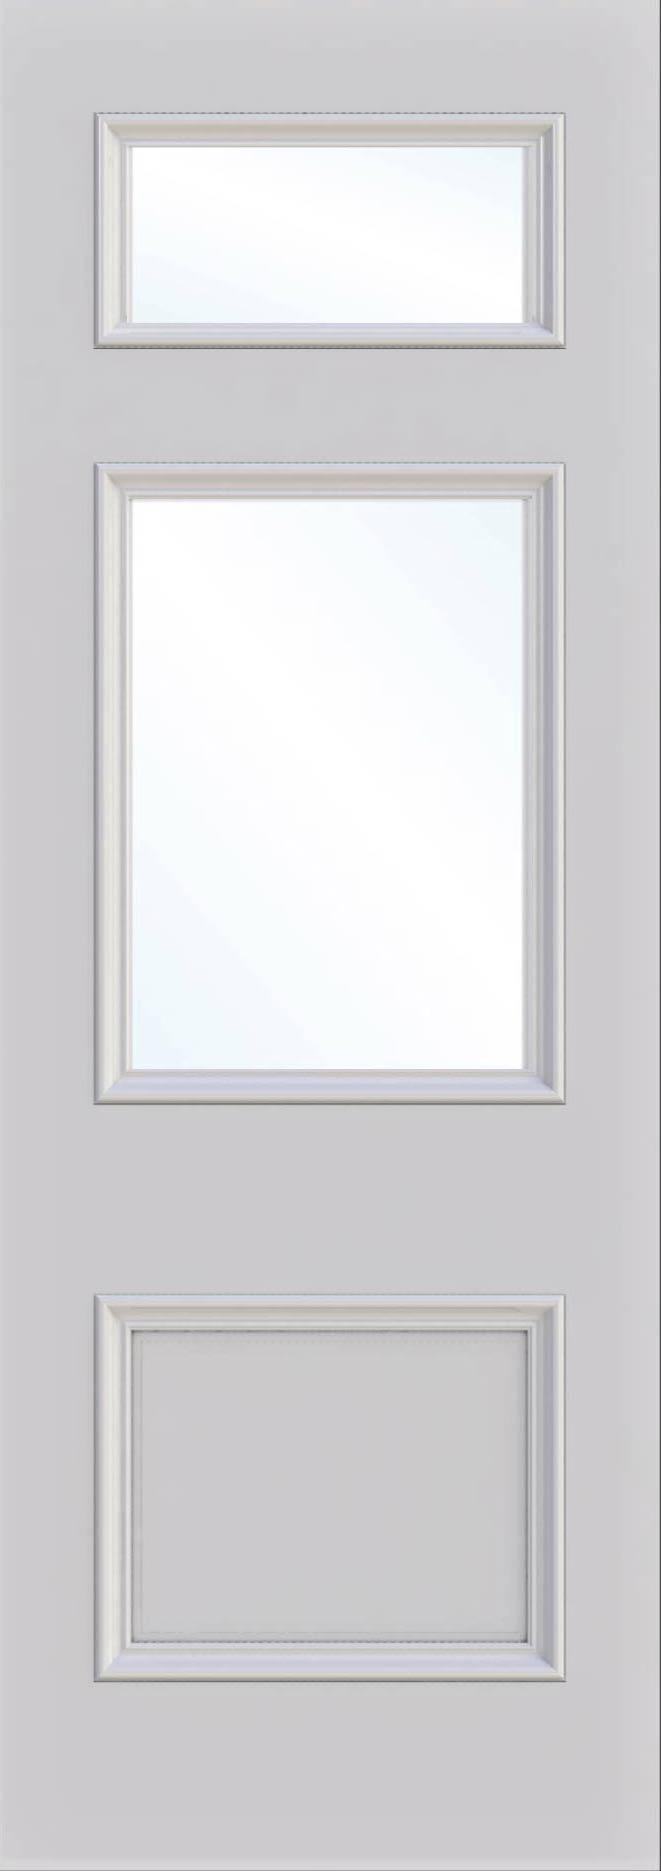 Croydon Single Glass Fire Door